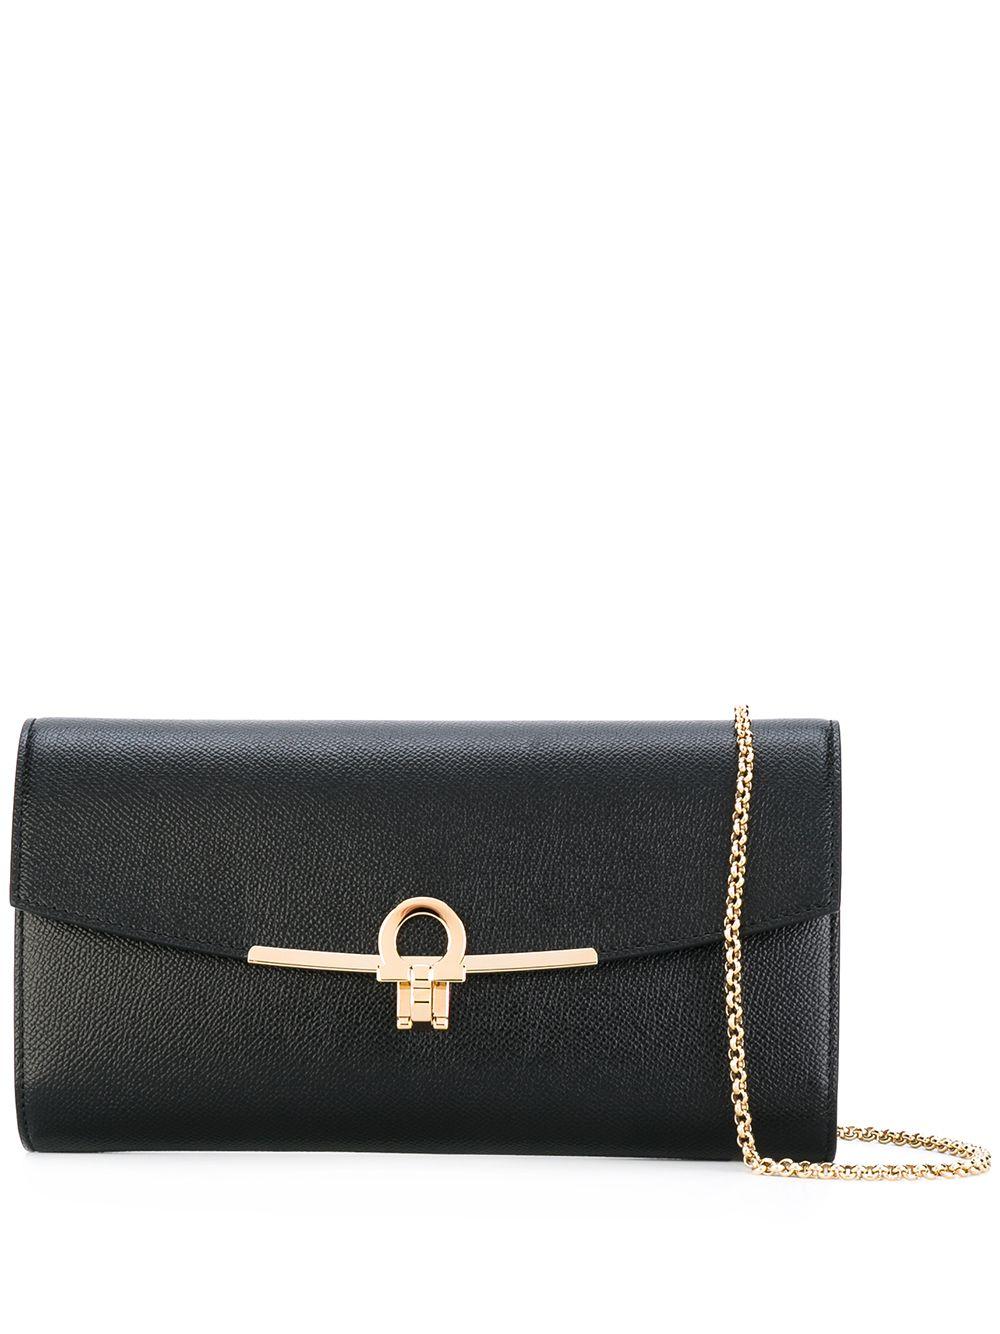 Gancino Clip Leather Mini Bag